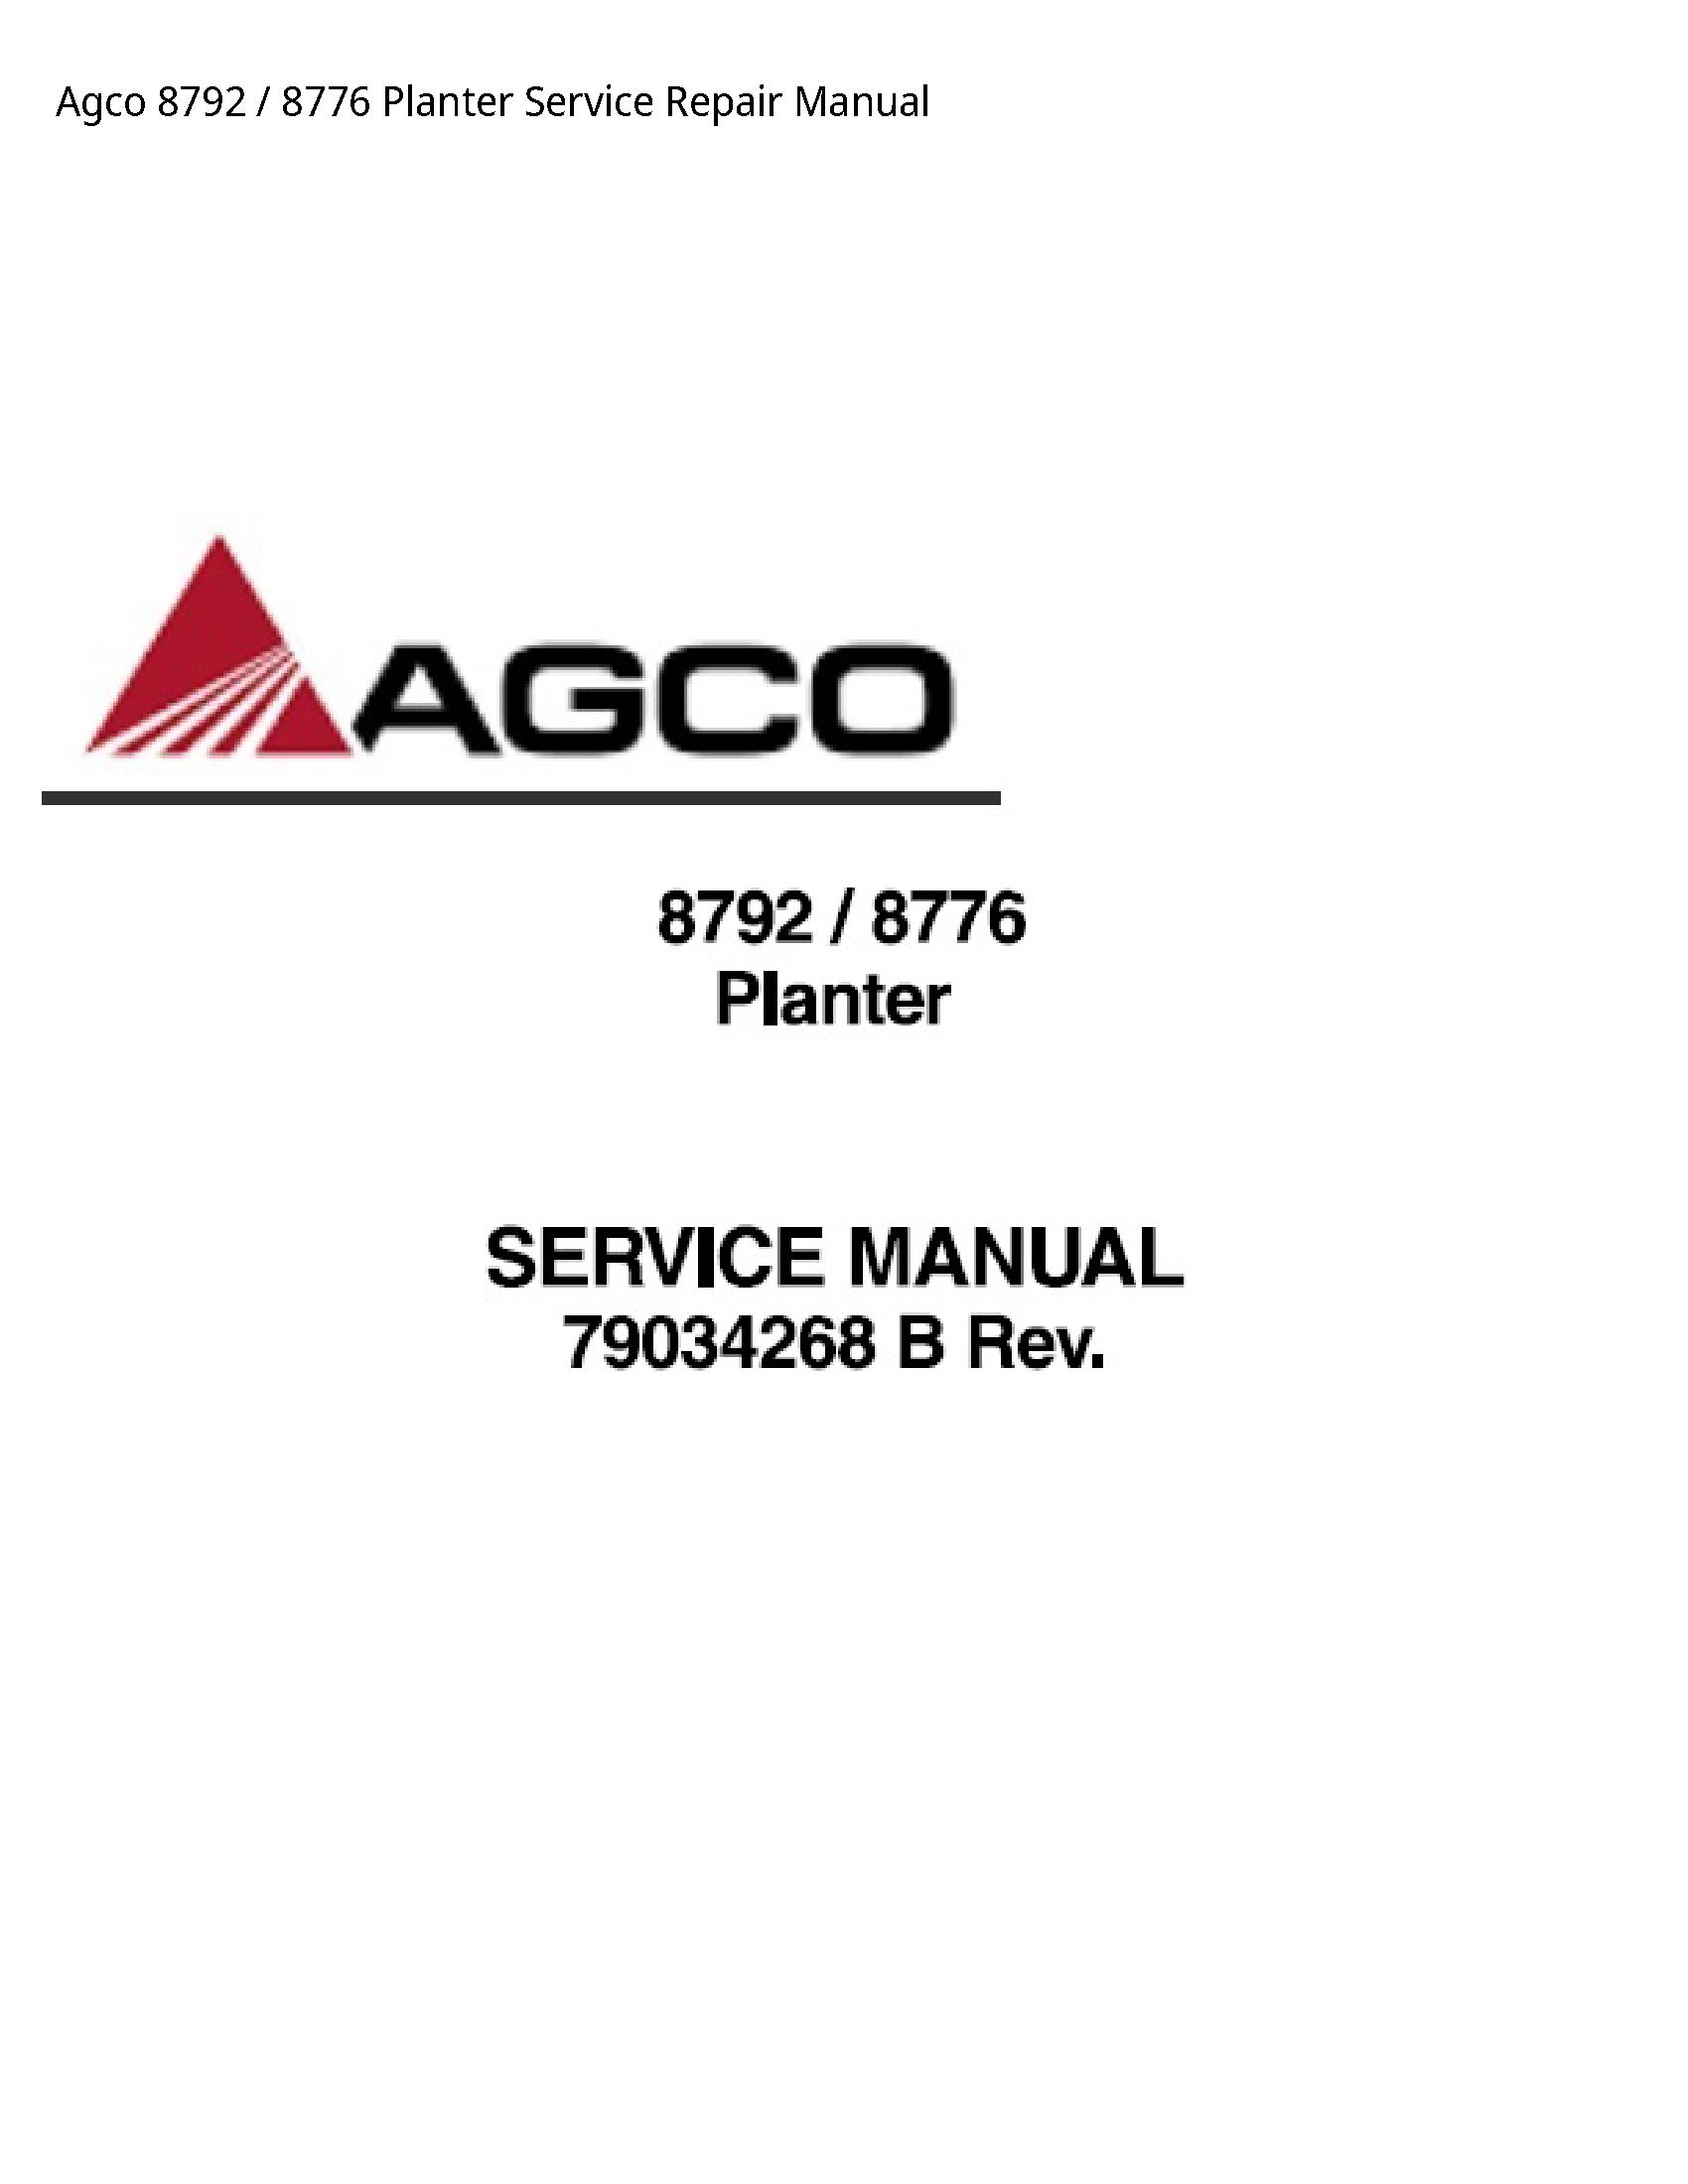 AGCO 8792 Planter manual